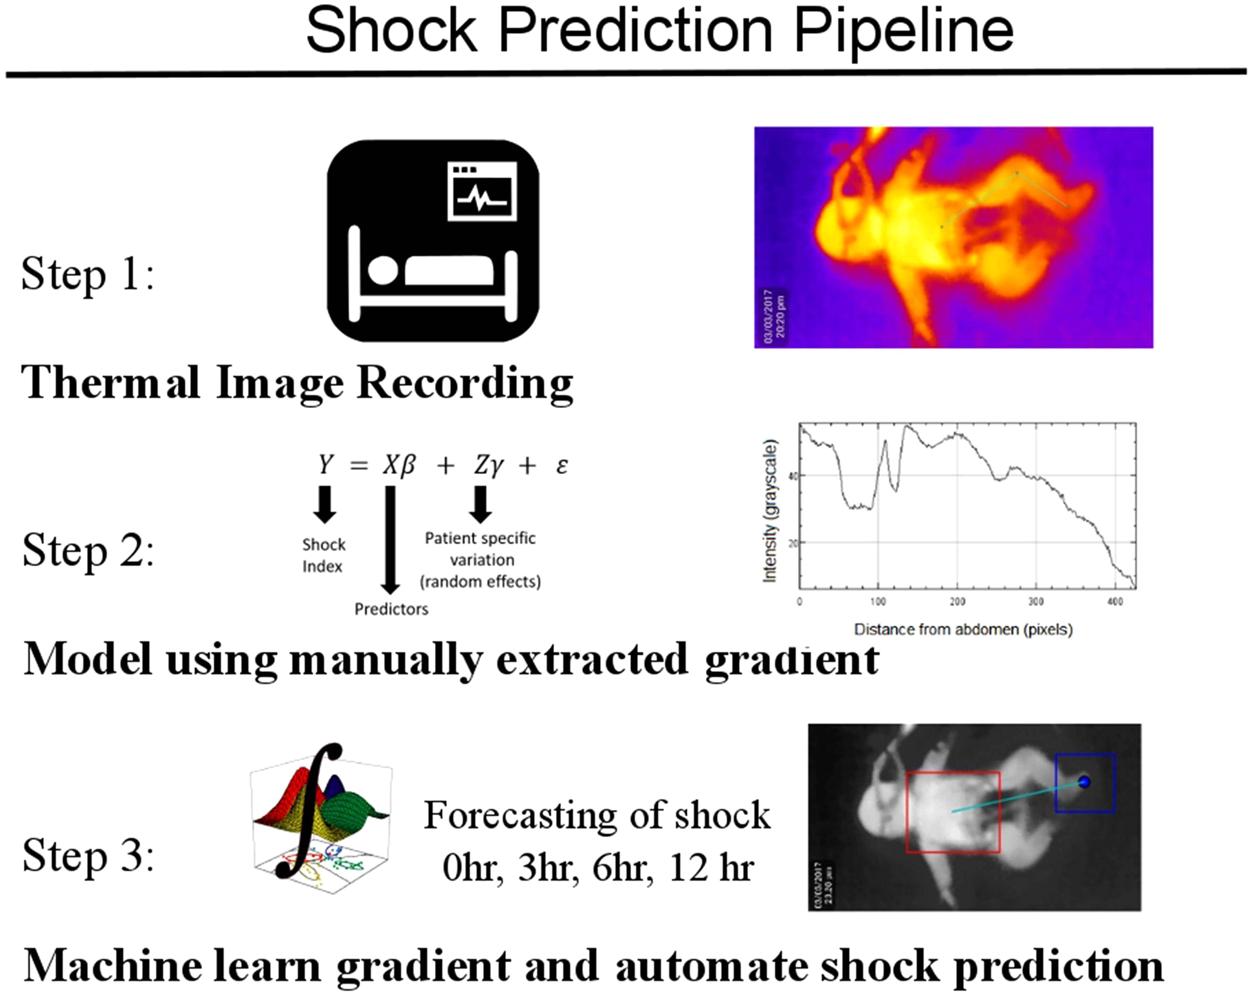 Predicting Hemodynamic Shock from Thermal Images using